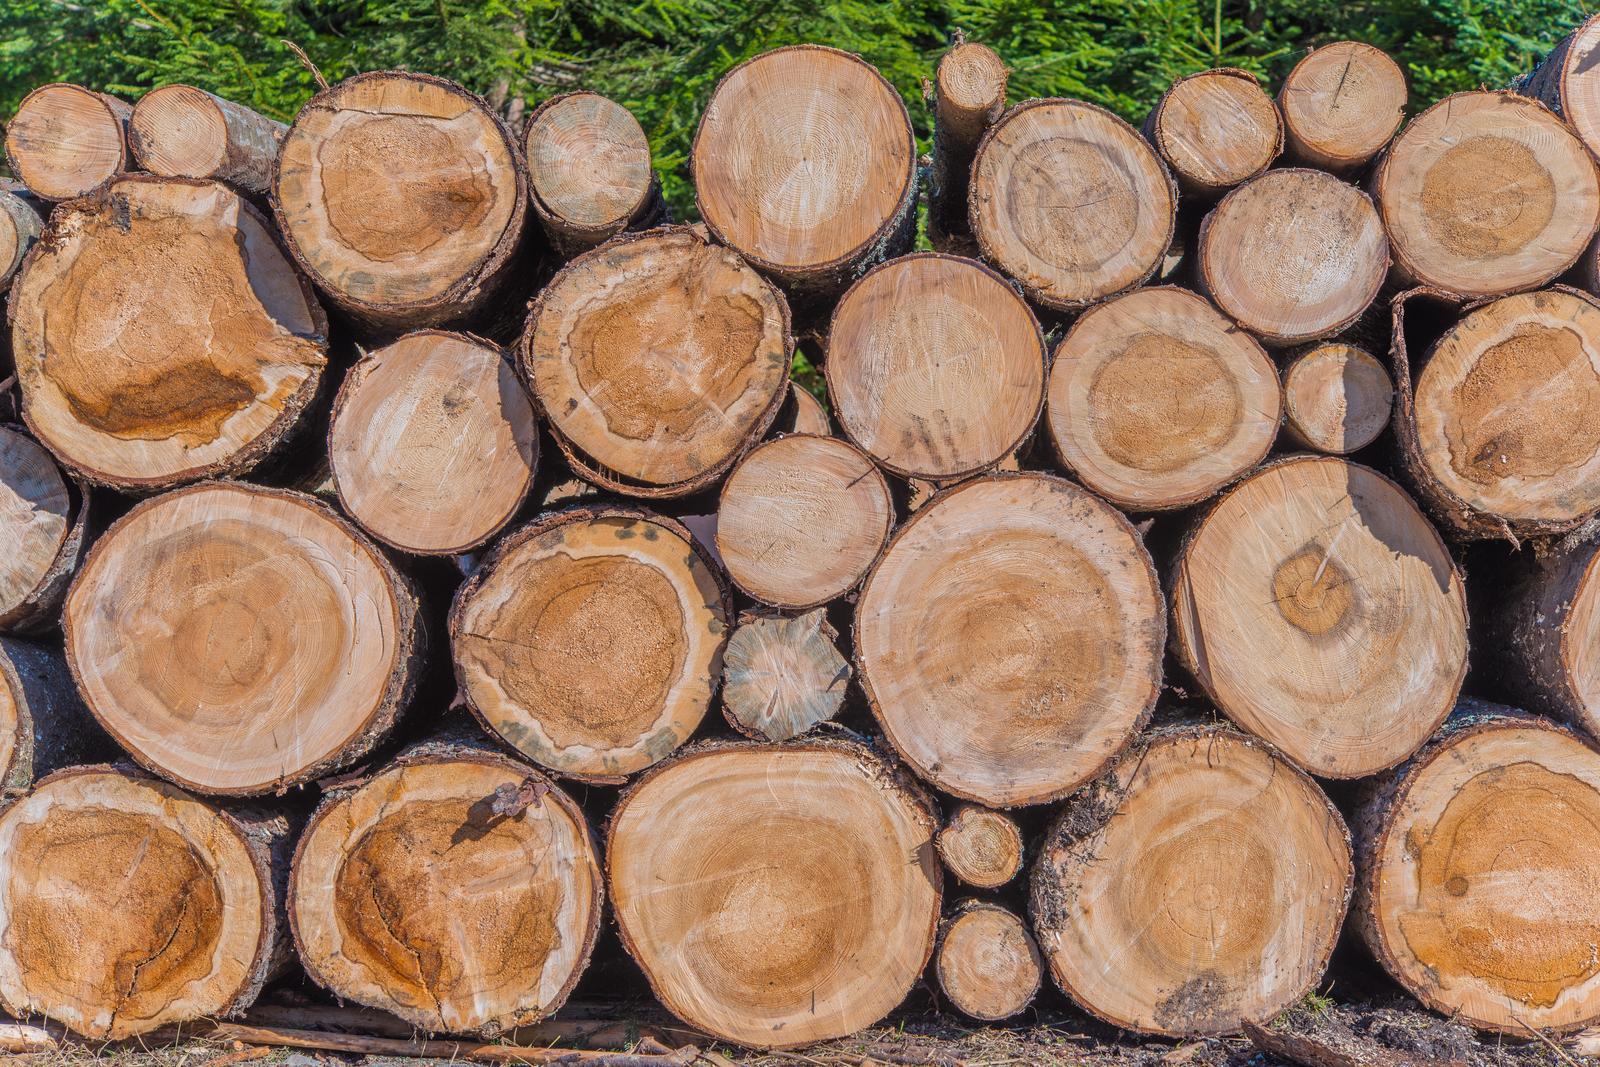 Logging in Harju county